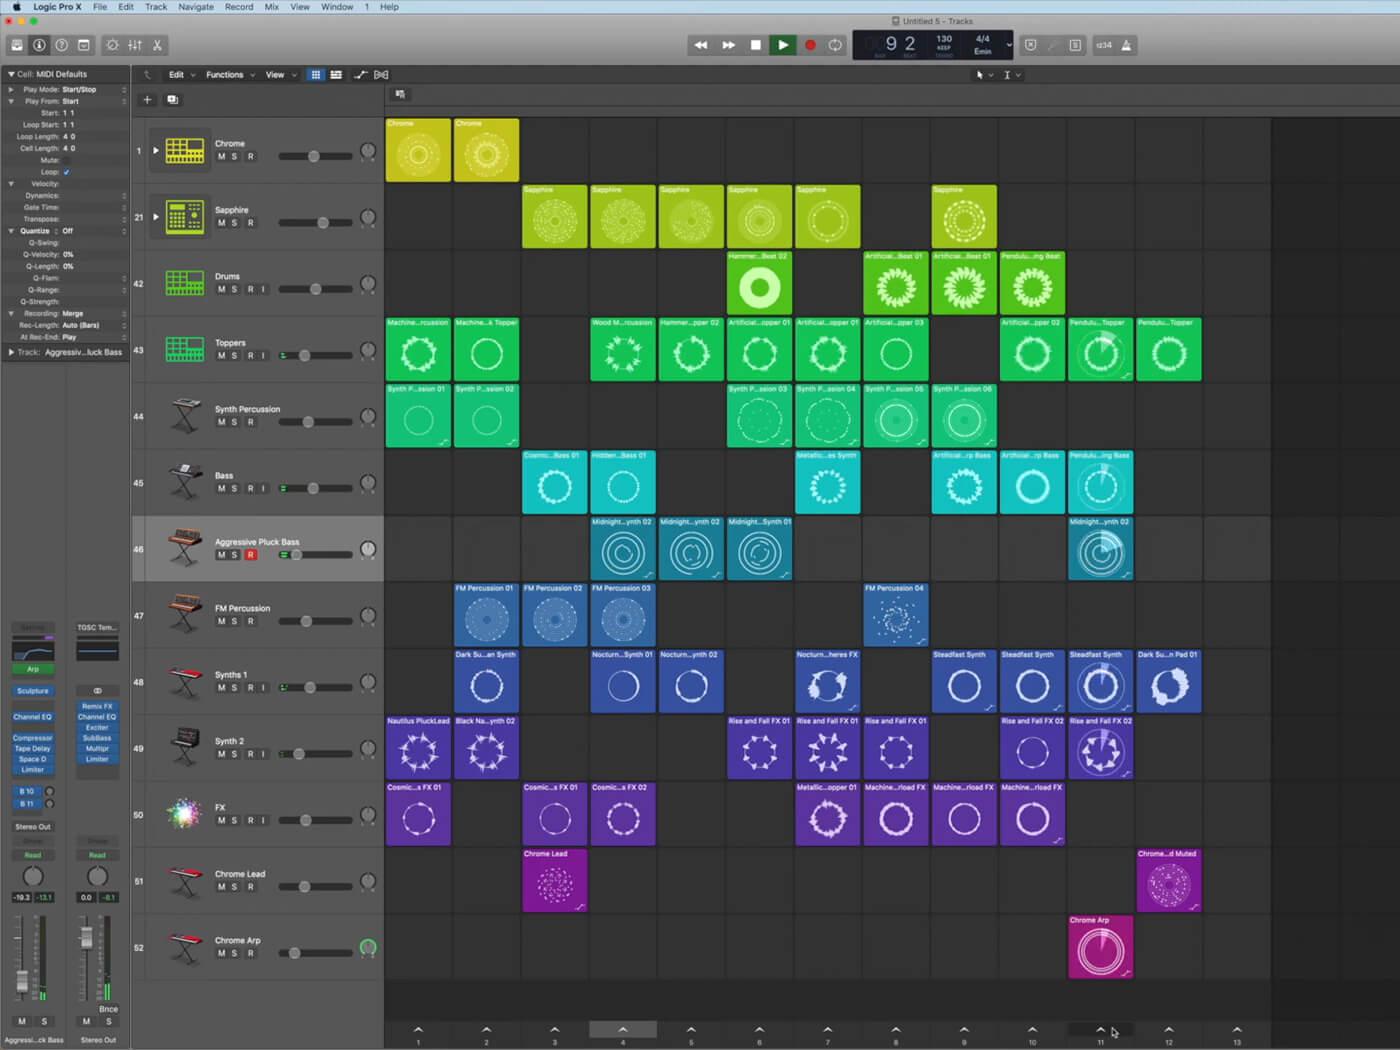 Logic Pro X 10.5 Masterclass | MusicTech